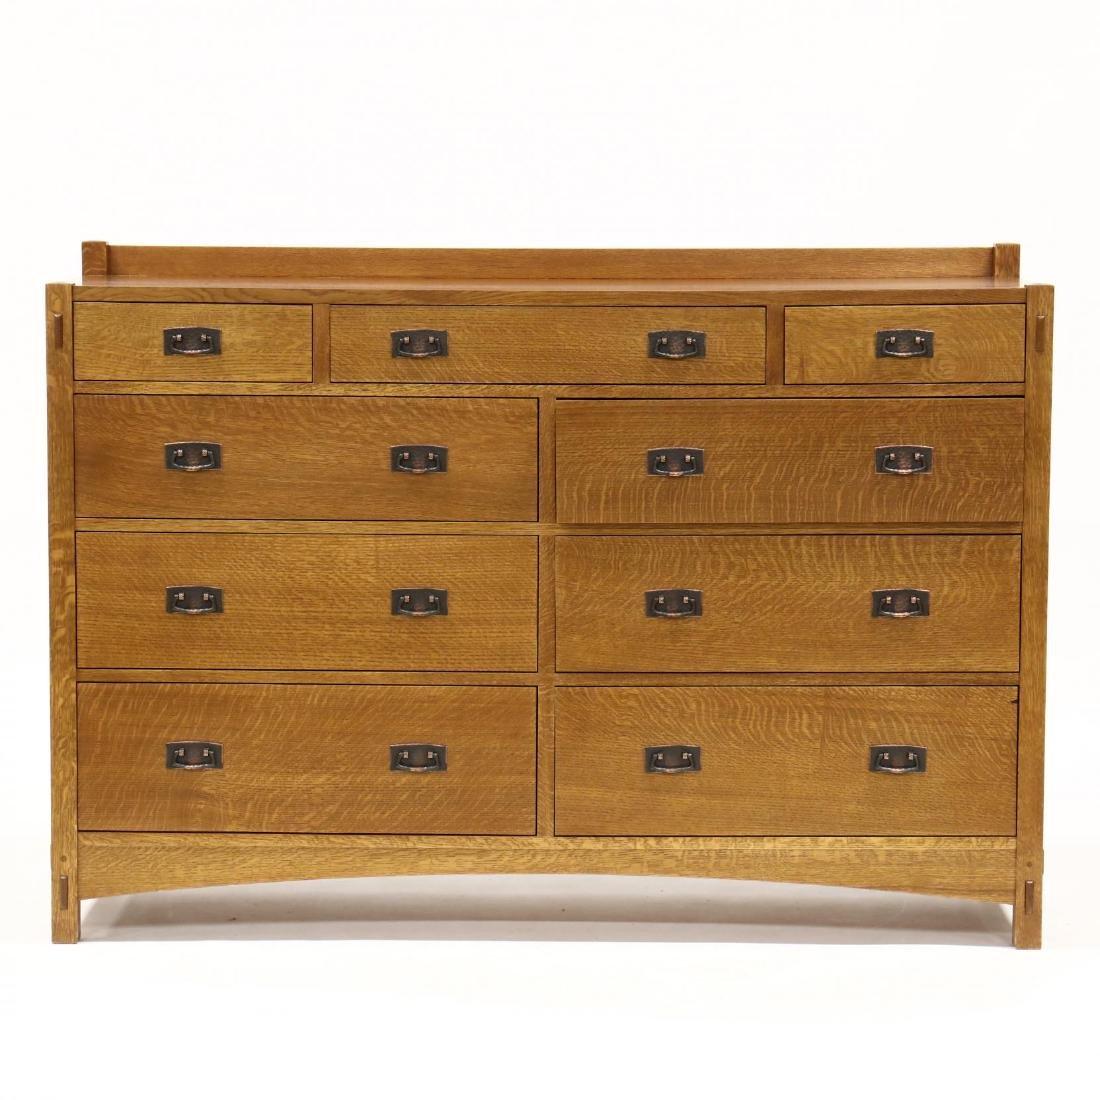 Stickley, Mission Style Oak Dresser